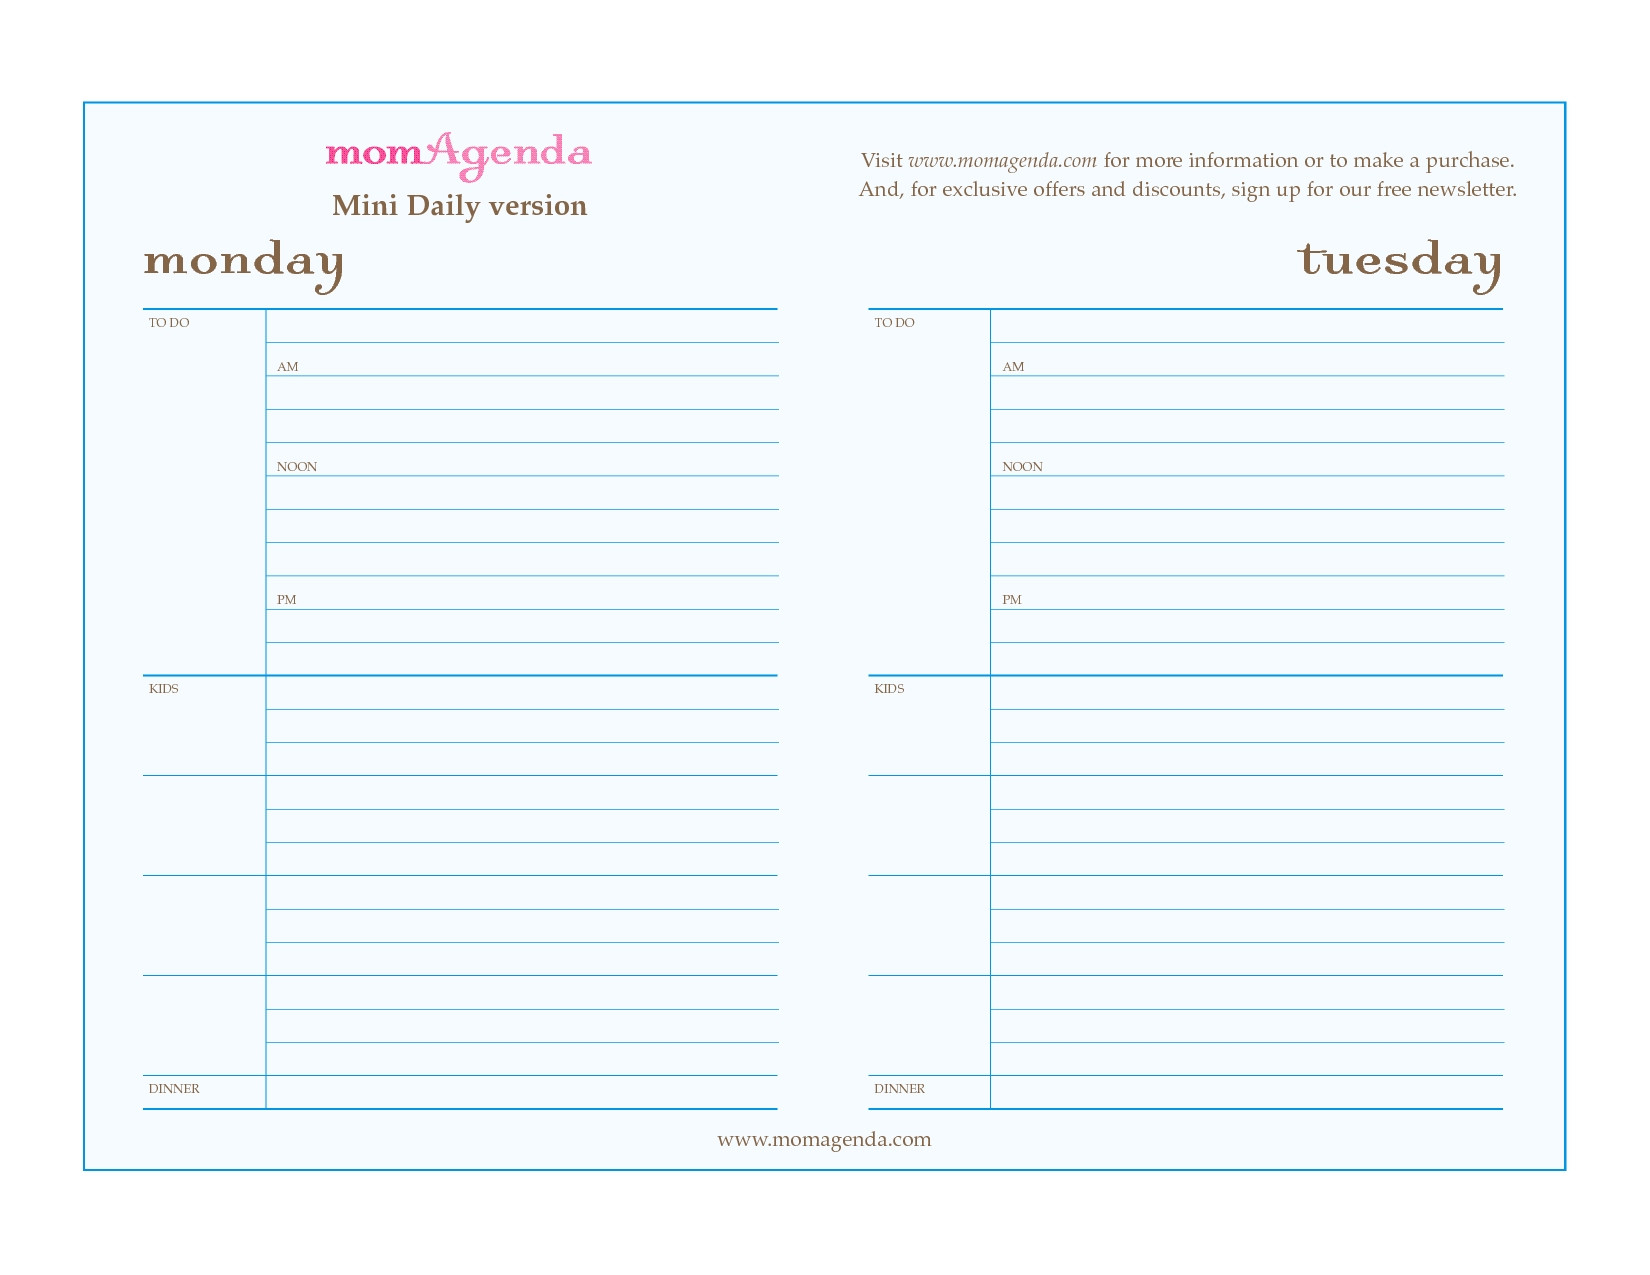 Free Editable Daily Calendar :-Free Calendar Template  Printable Editable Daily Schedule Template